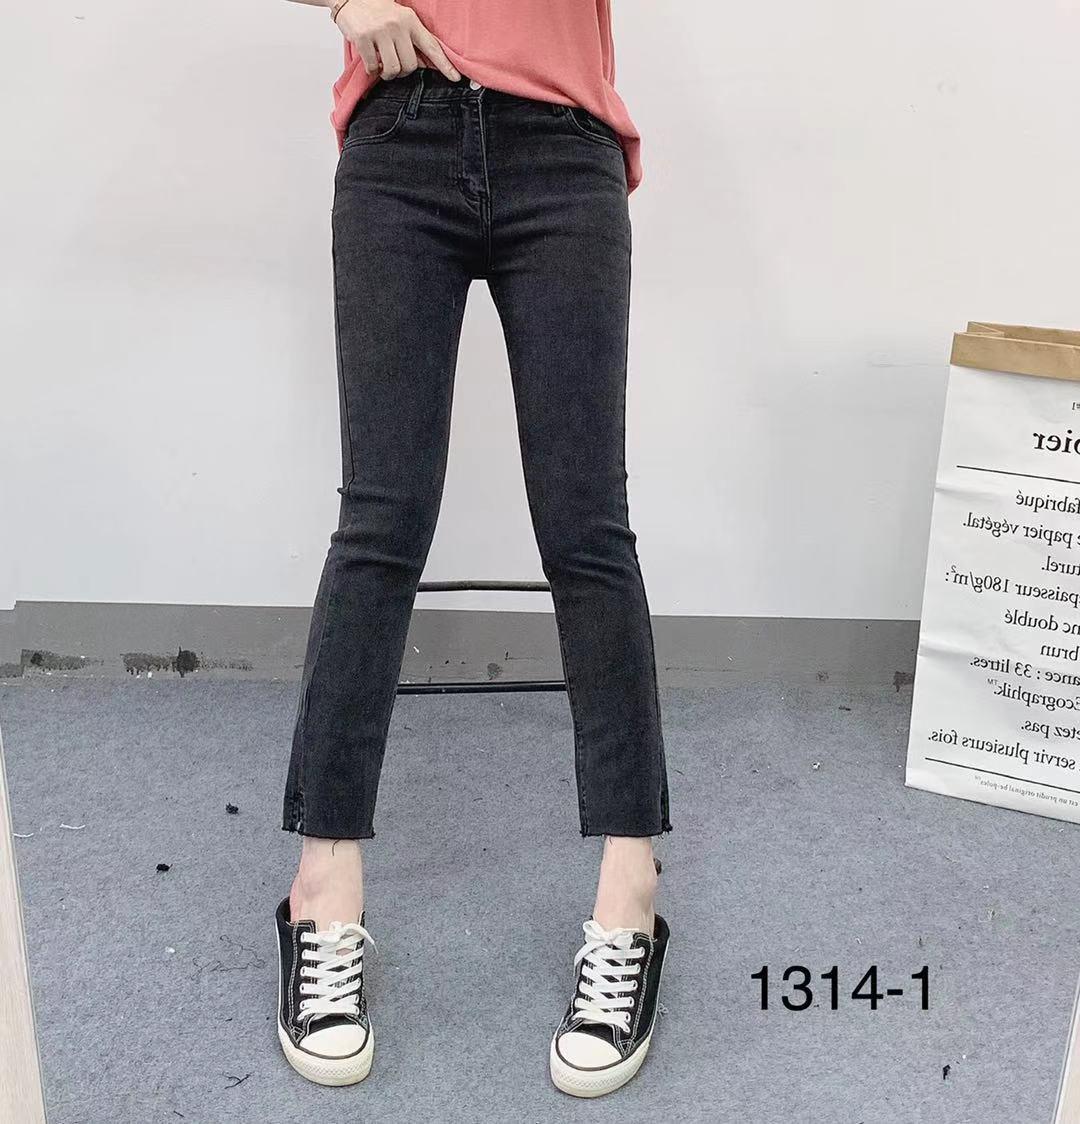 MI CO DENIM1314-1早秋新款韩版百搭修身显瘦简约款直筒牛仔裤女